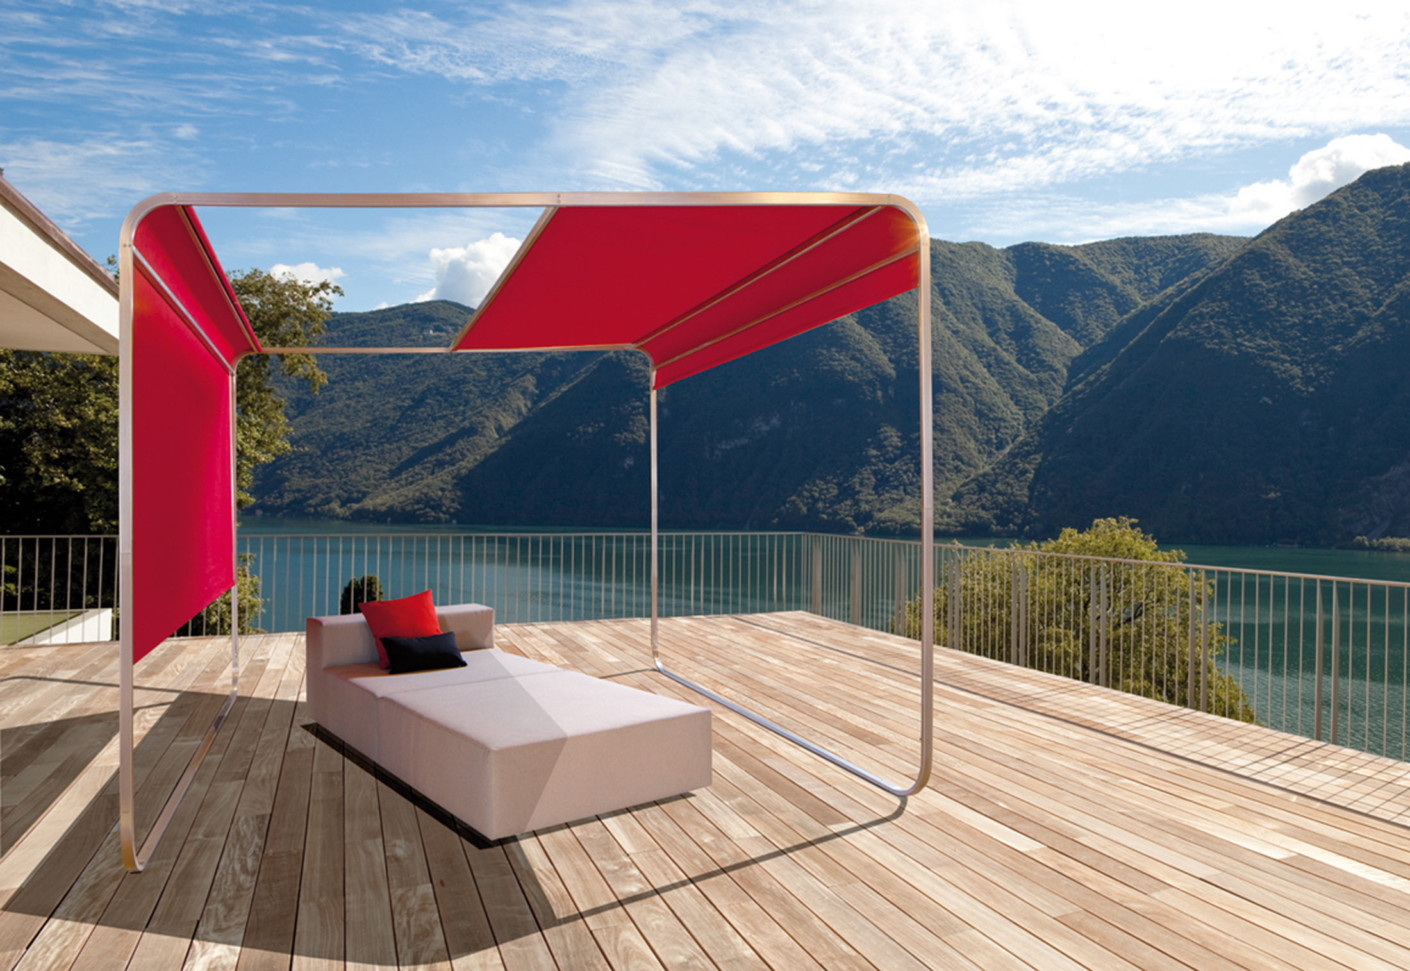 Gartenpavillon design  Shangrila by April Furniture | STYLEPARK